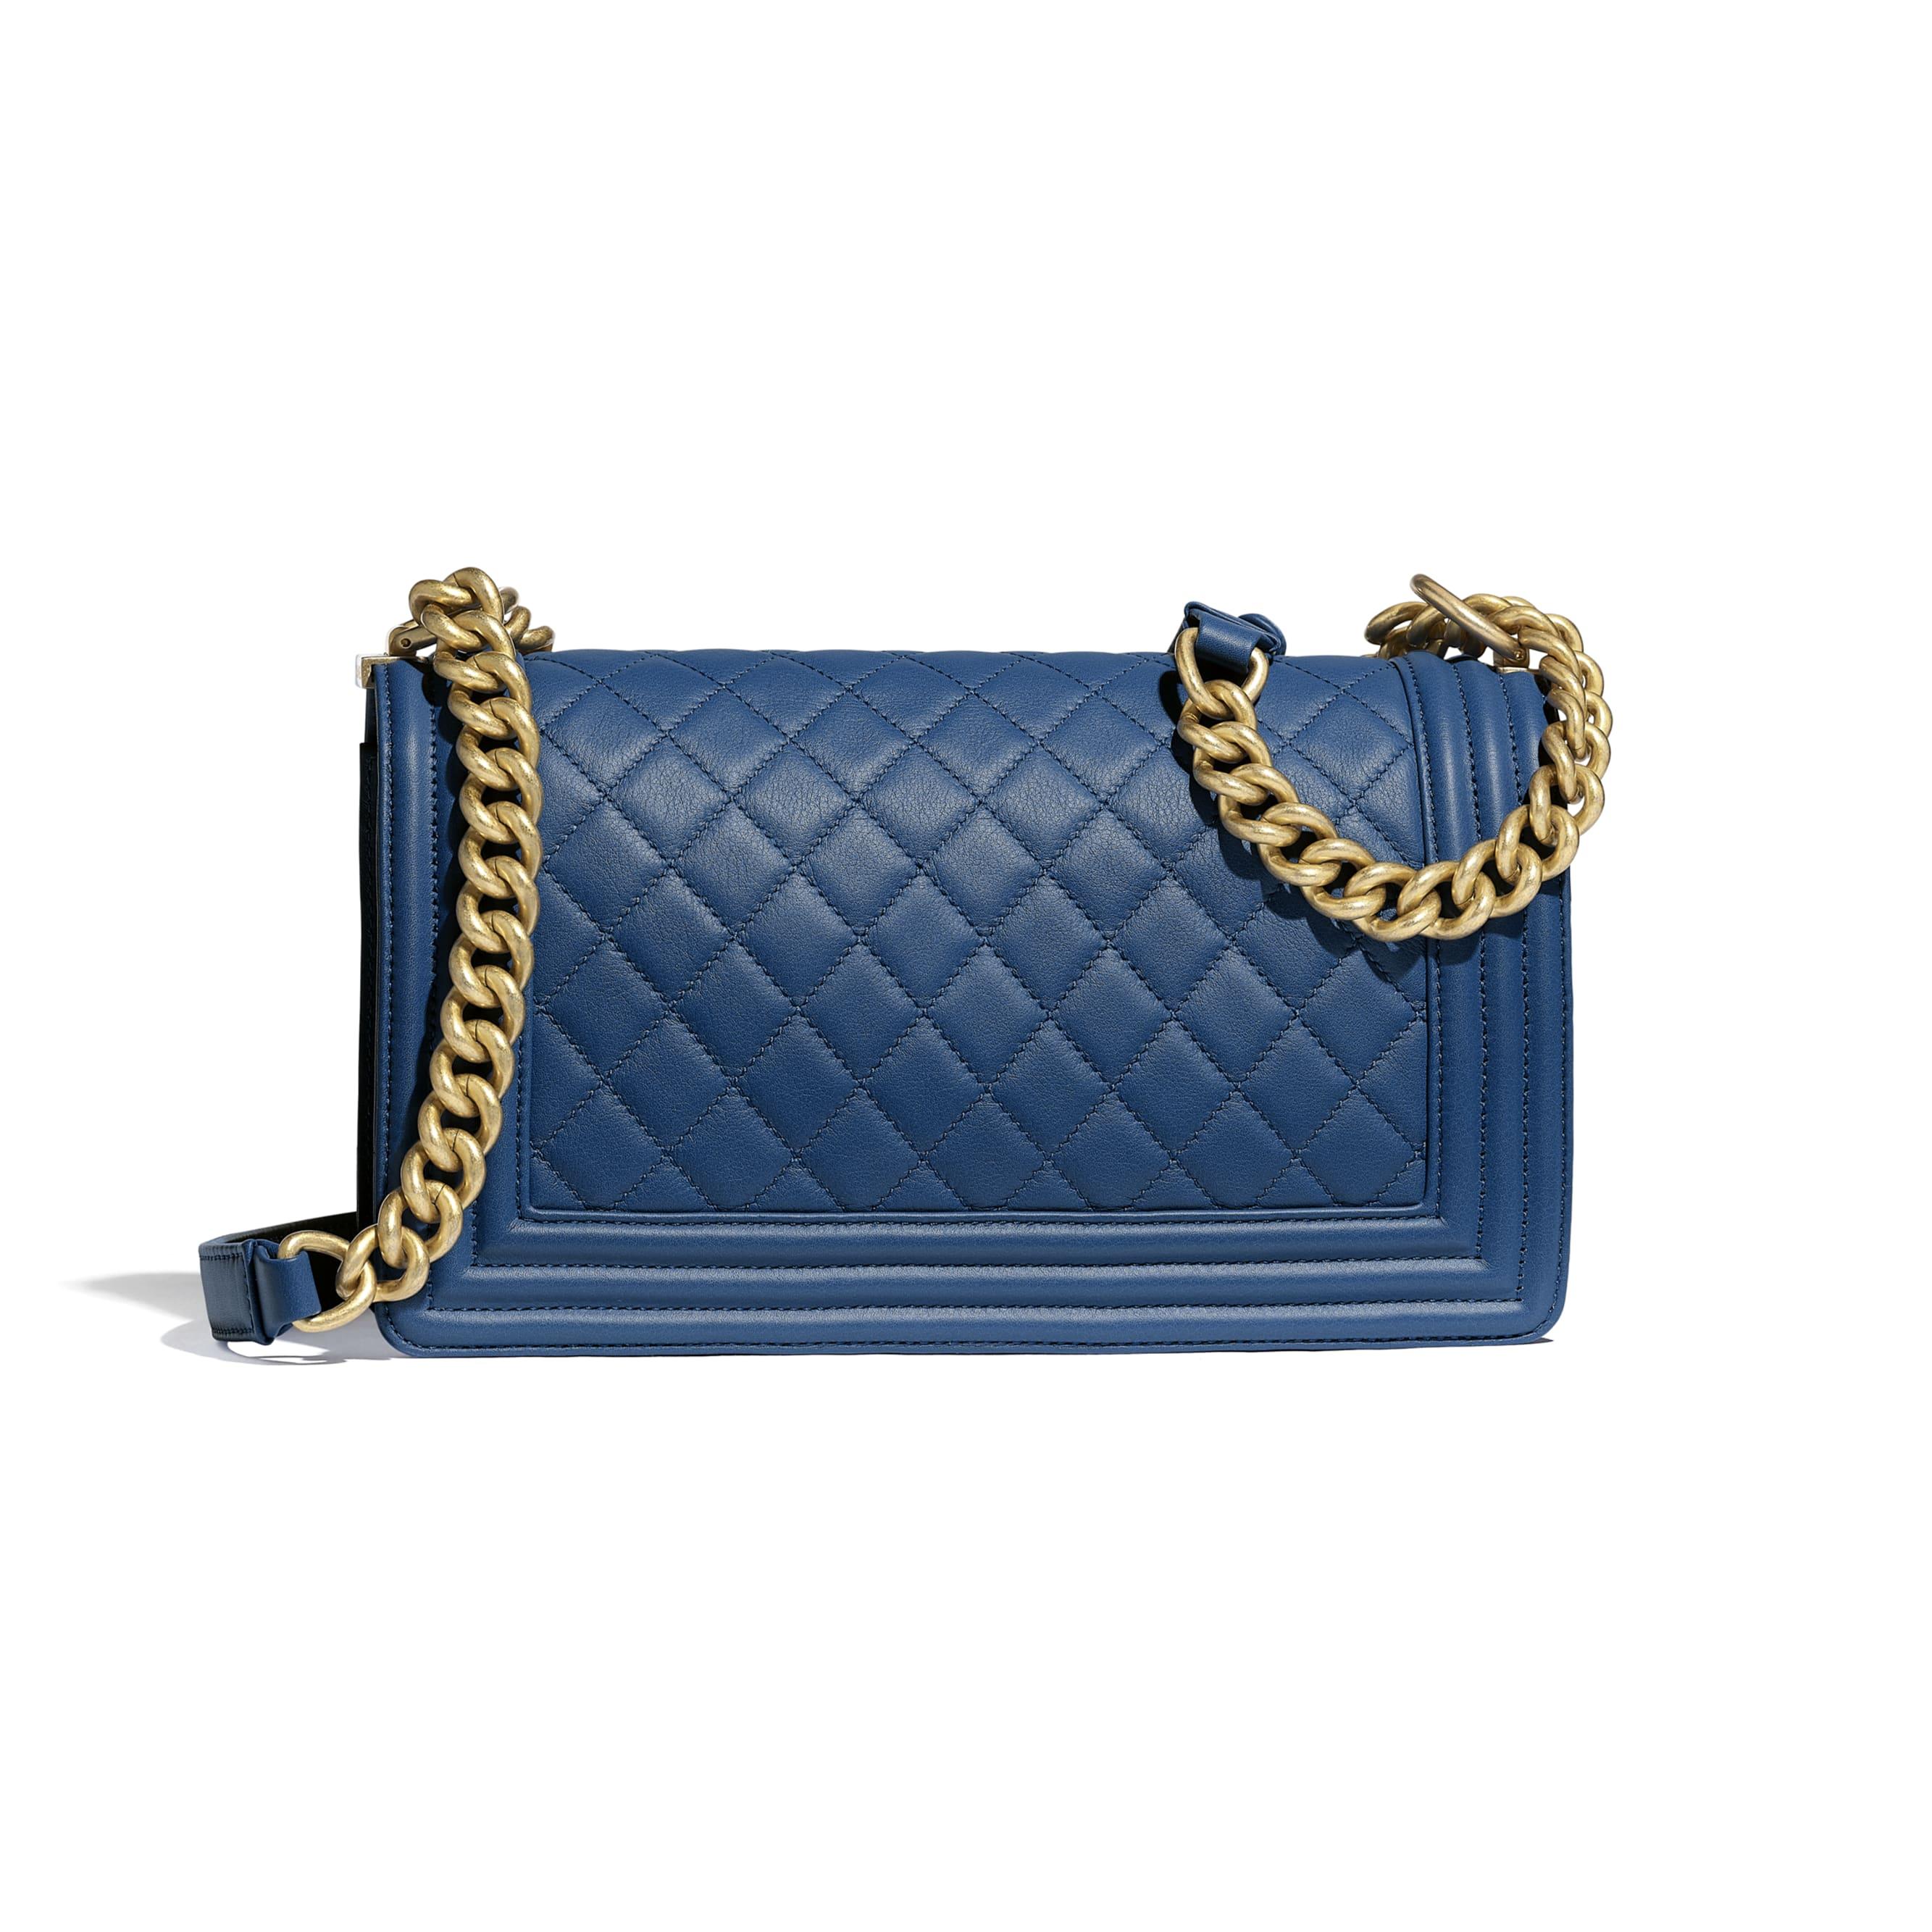 BOY CHANEL Handbag - Dark Blue - Calfskin & Gold-Tone Metal - Alternative view - see standard sized version